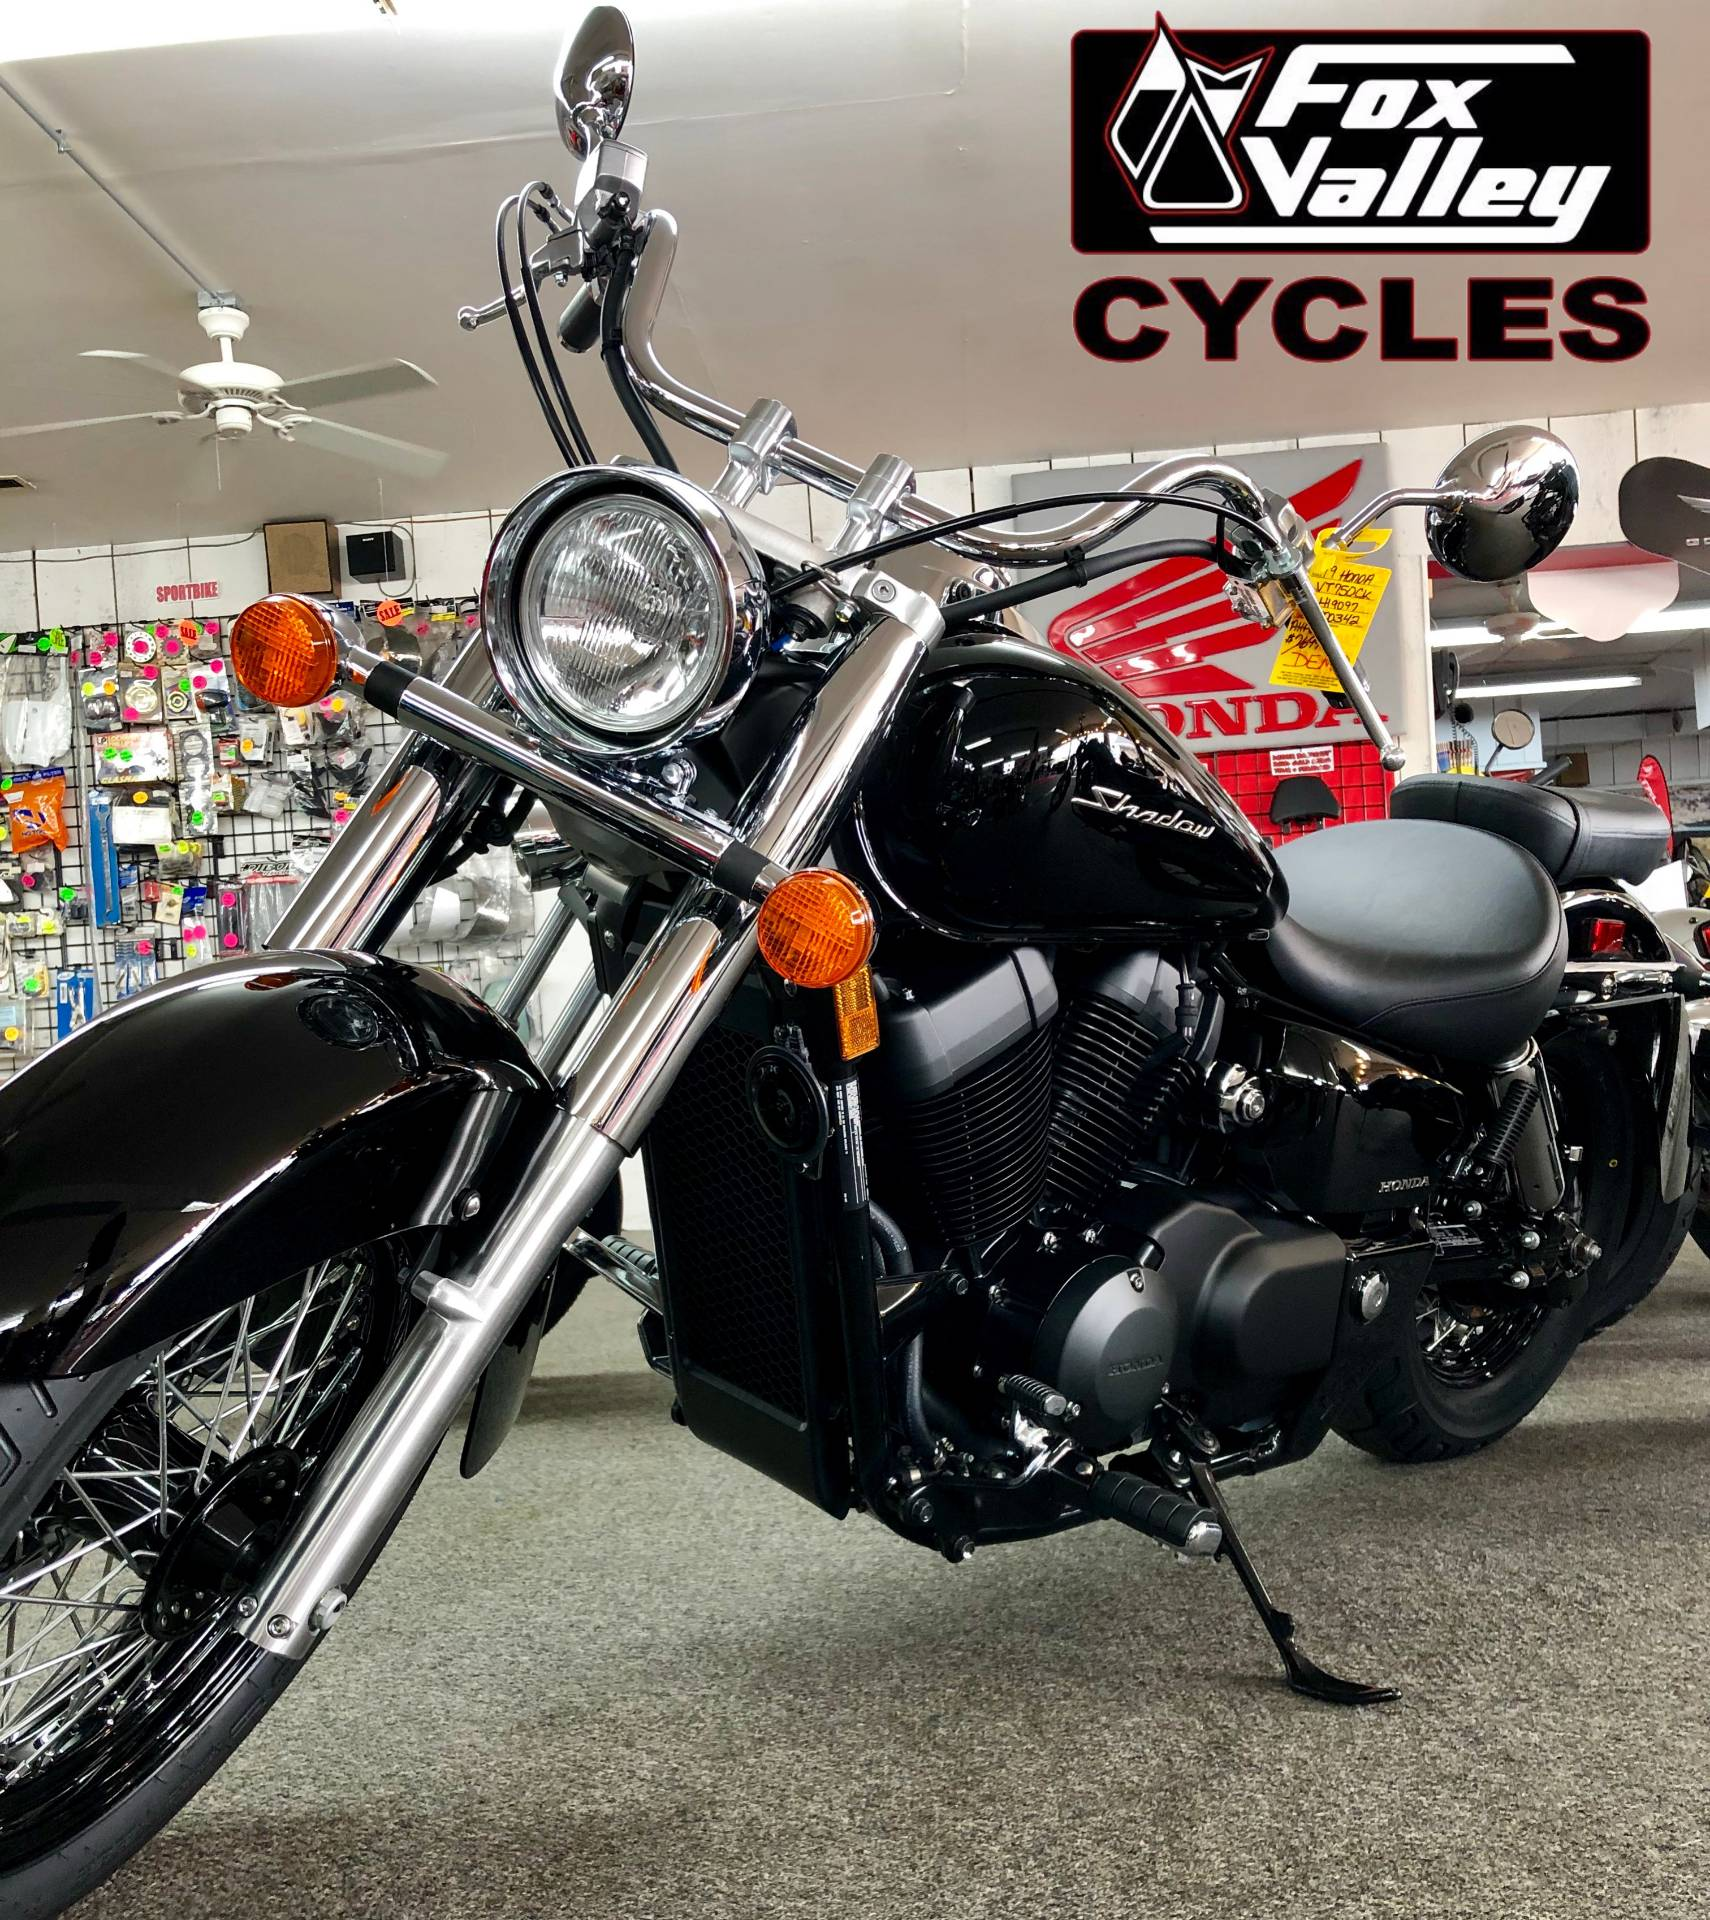 New 2019 Honda Shadow Aero 750 Motorcycles In Aurora Il Stock